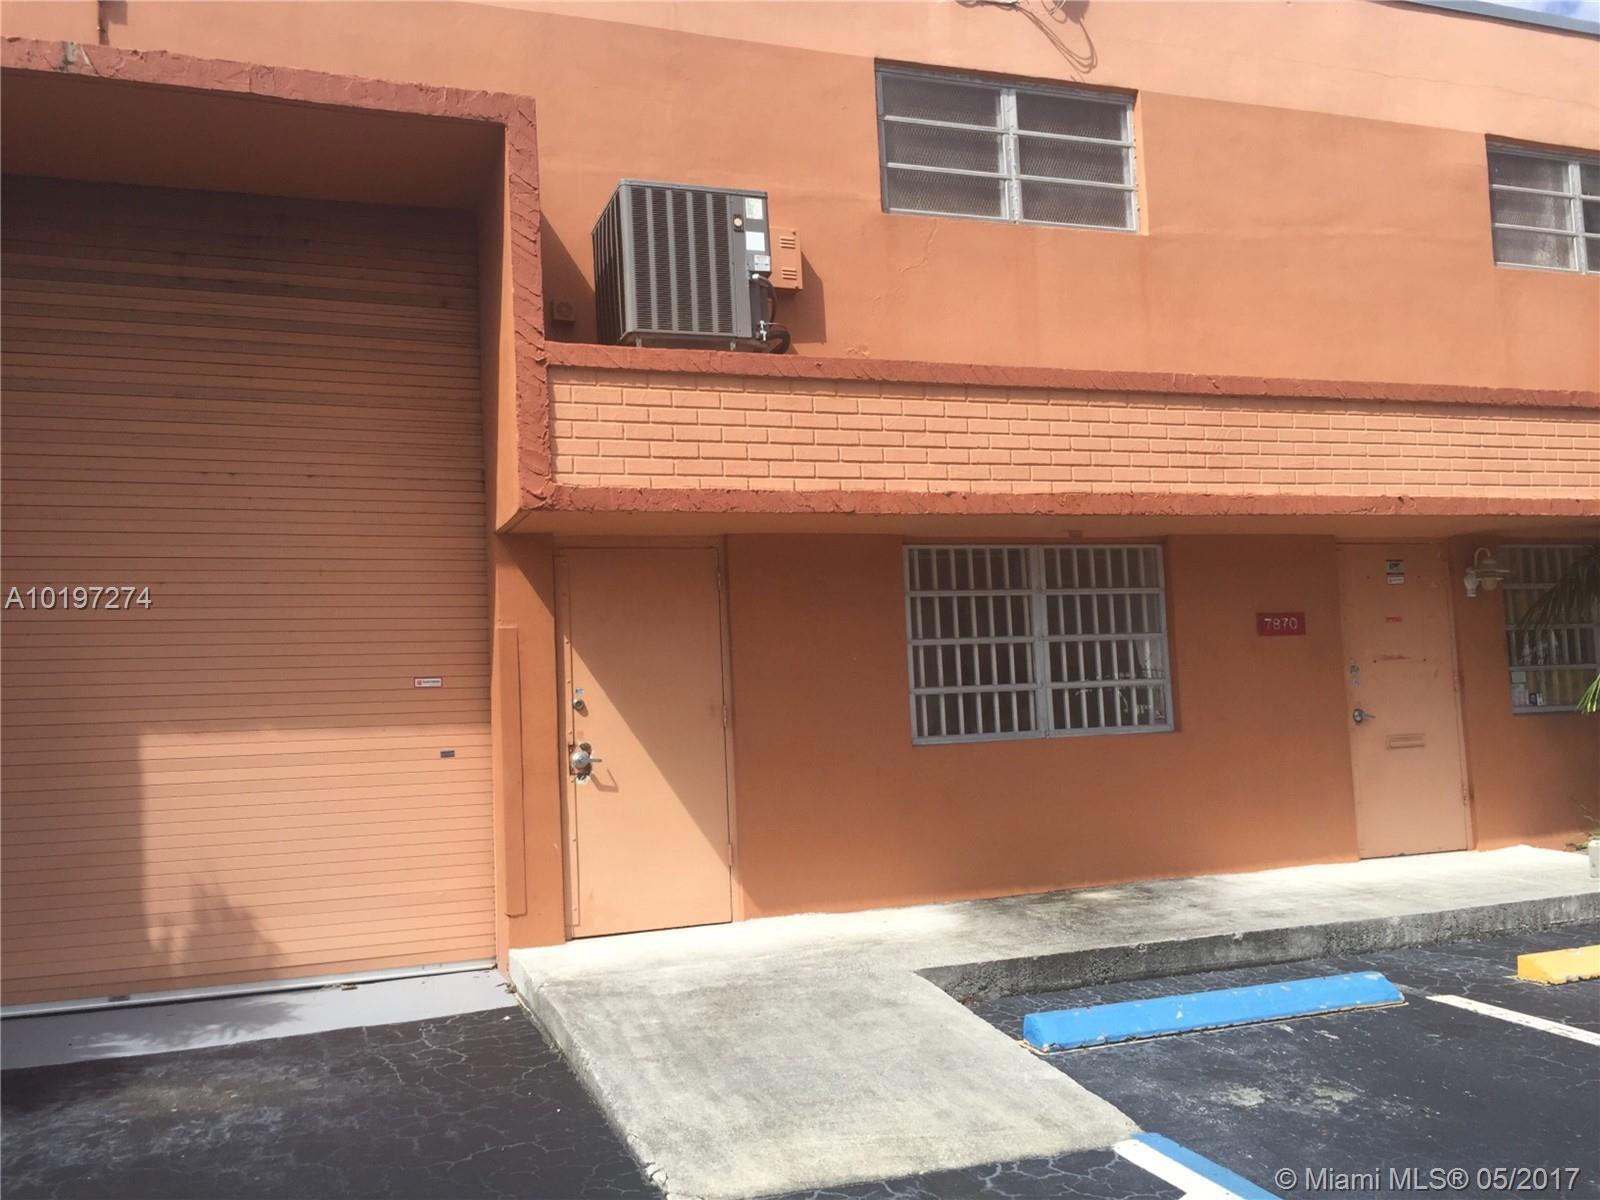 7870 NW 62nd St, Miami, FL 33166